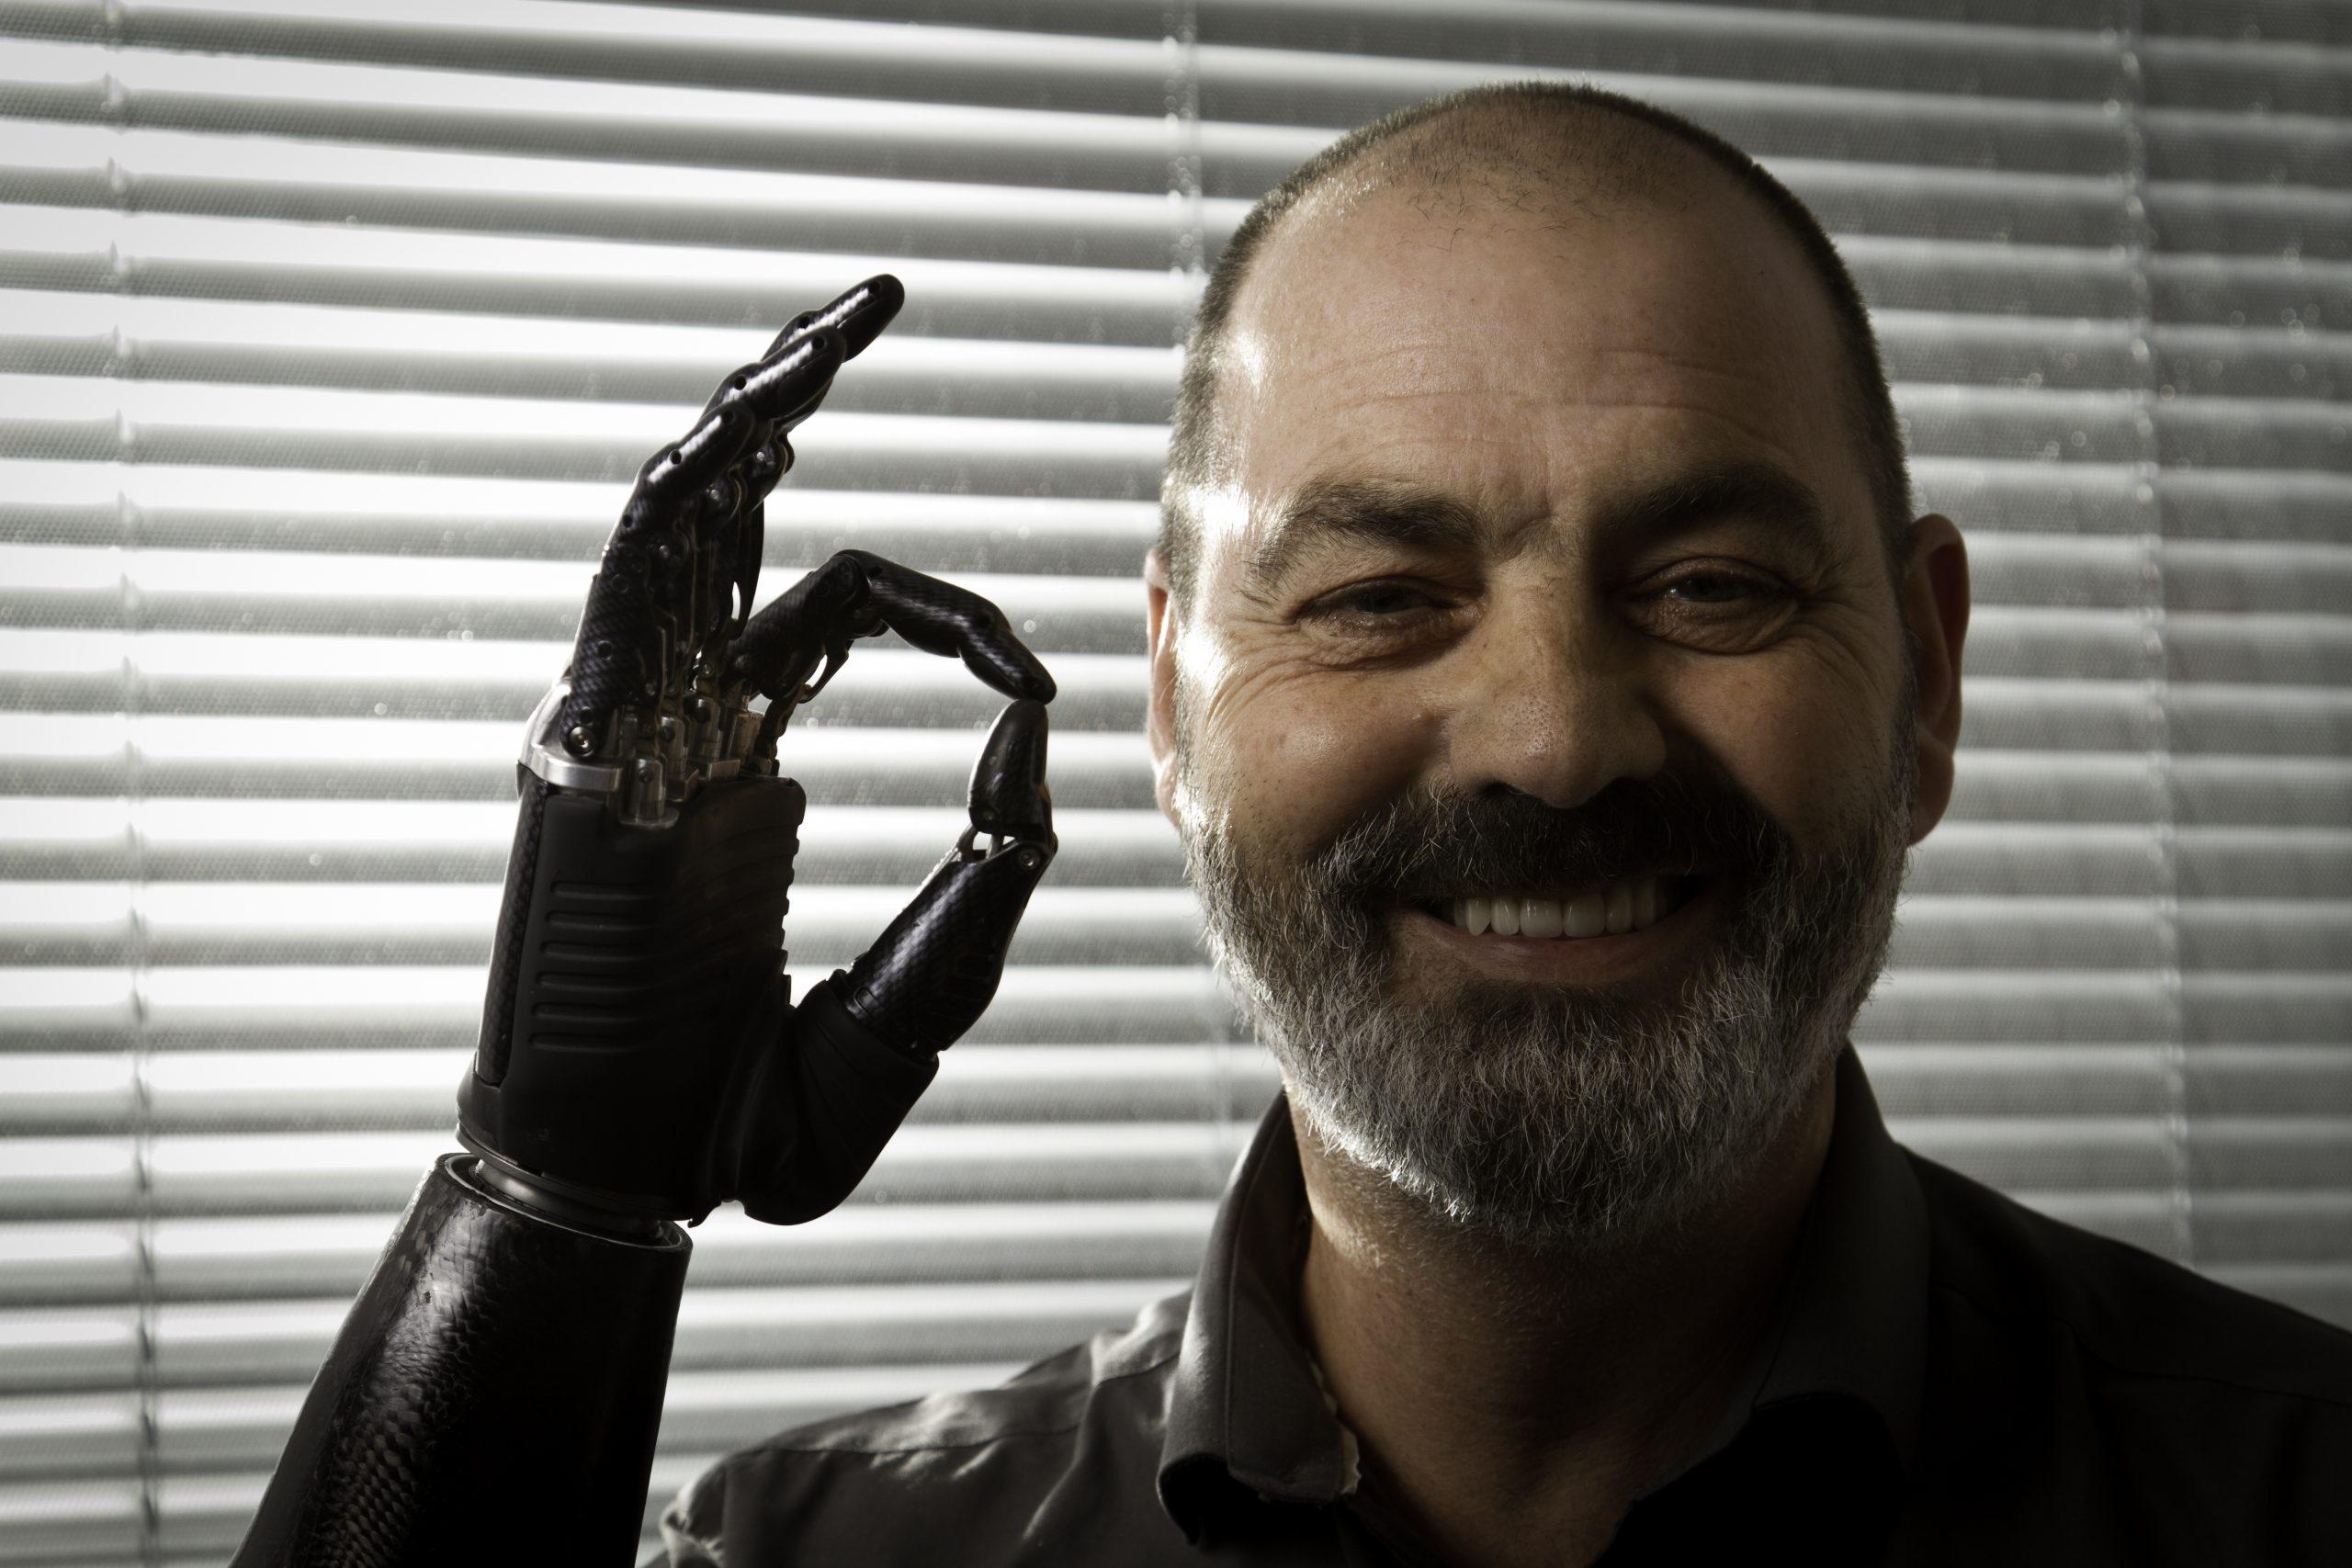 Bionic hand makes Super Bowl